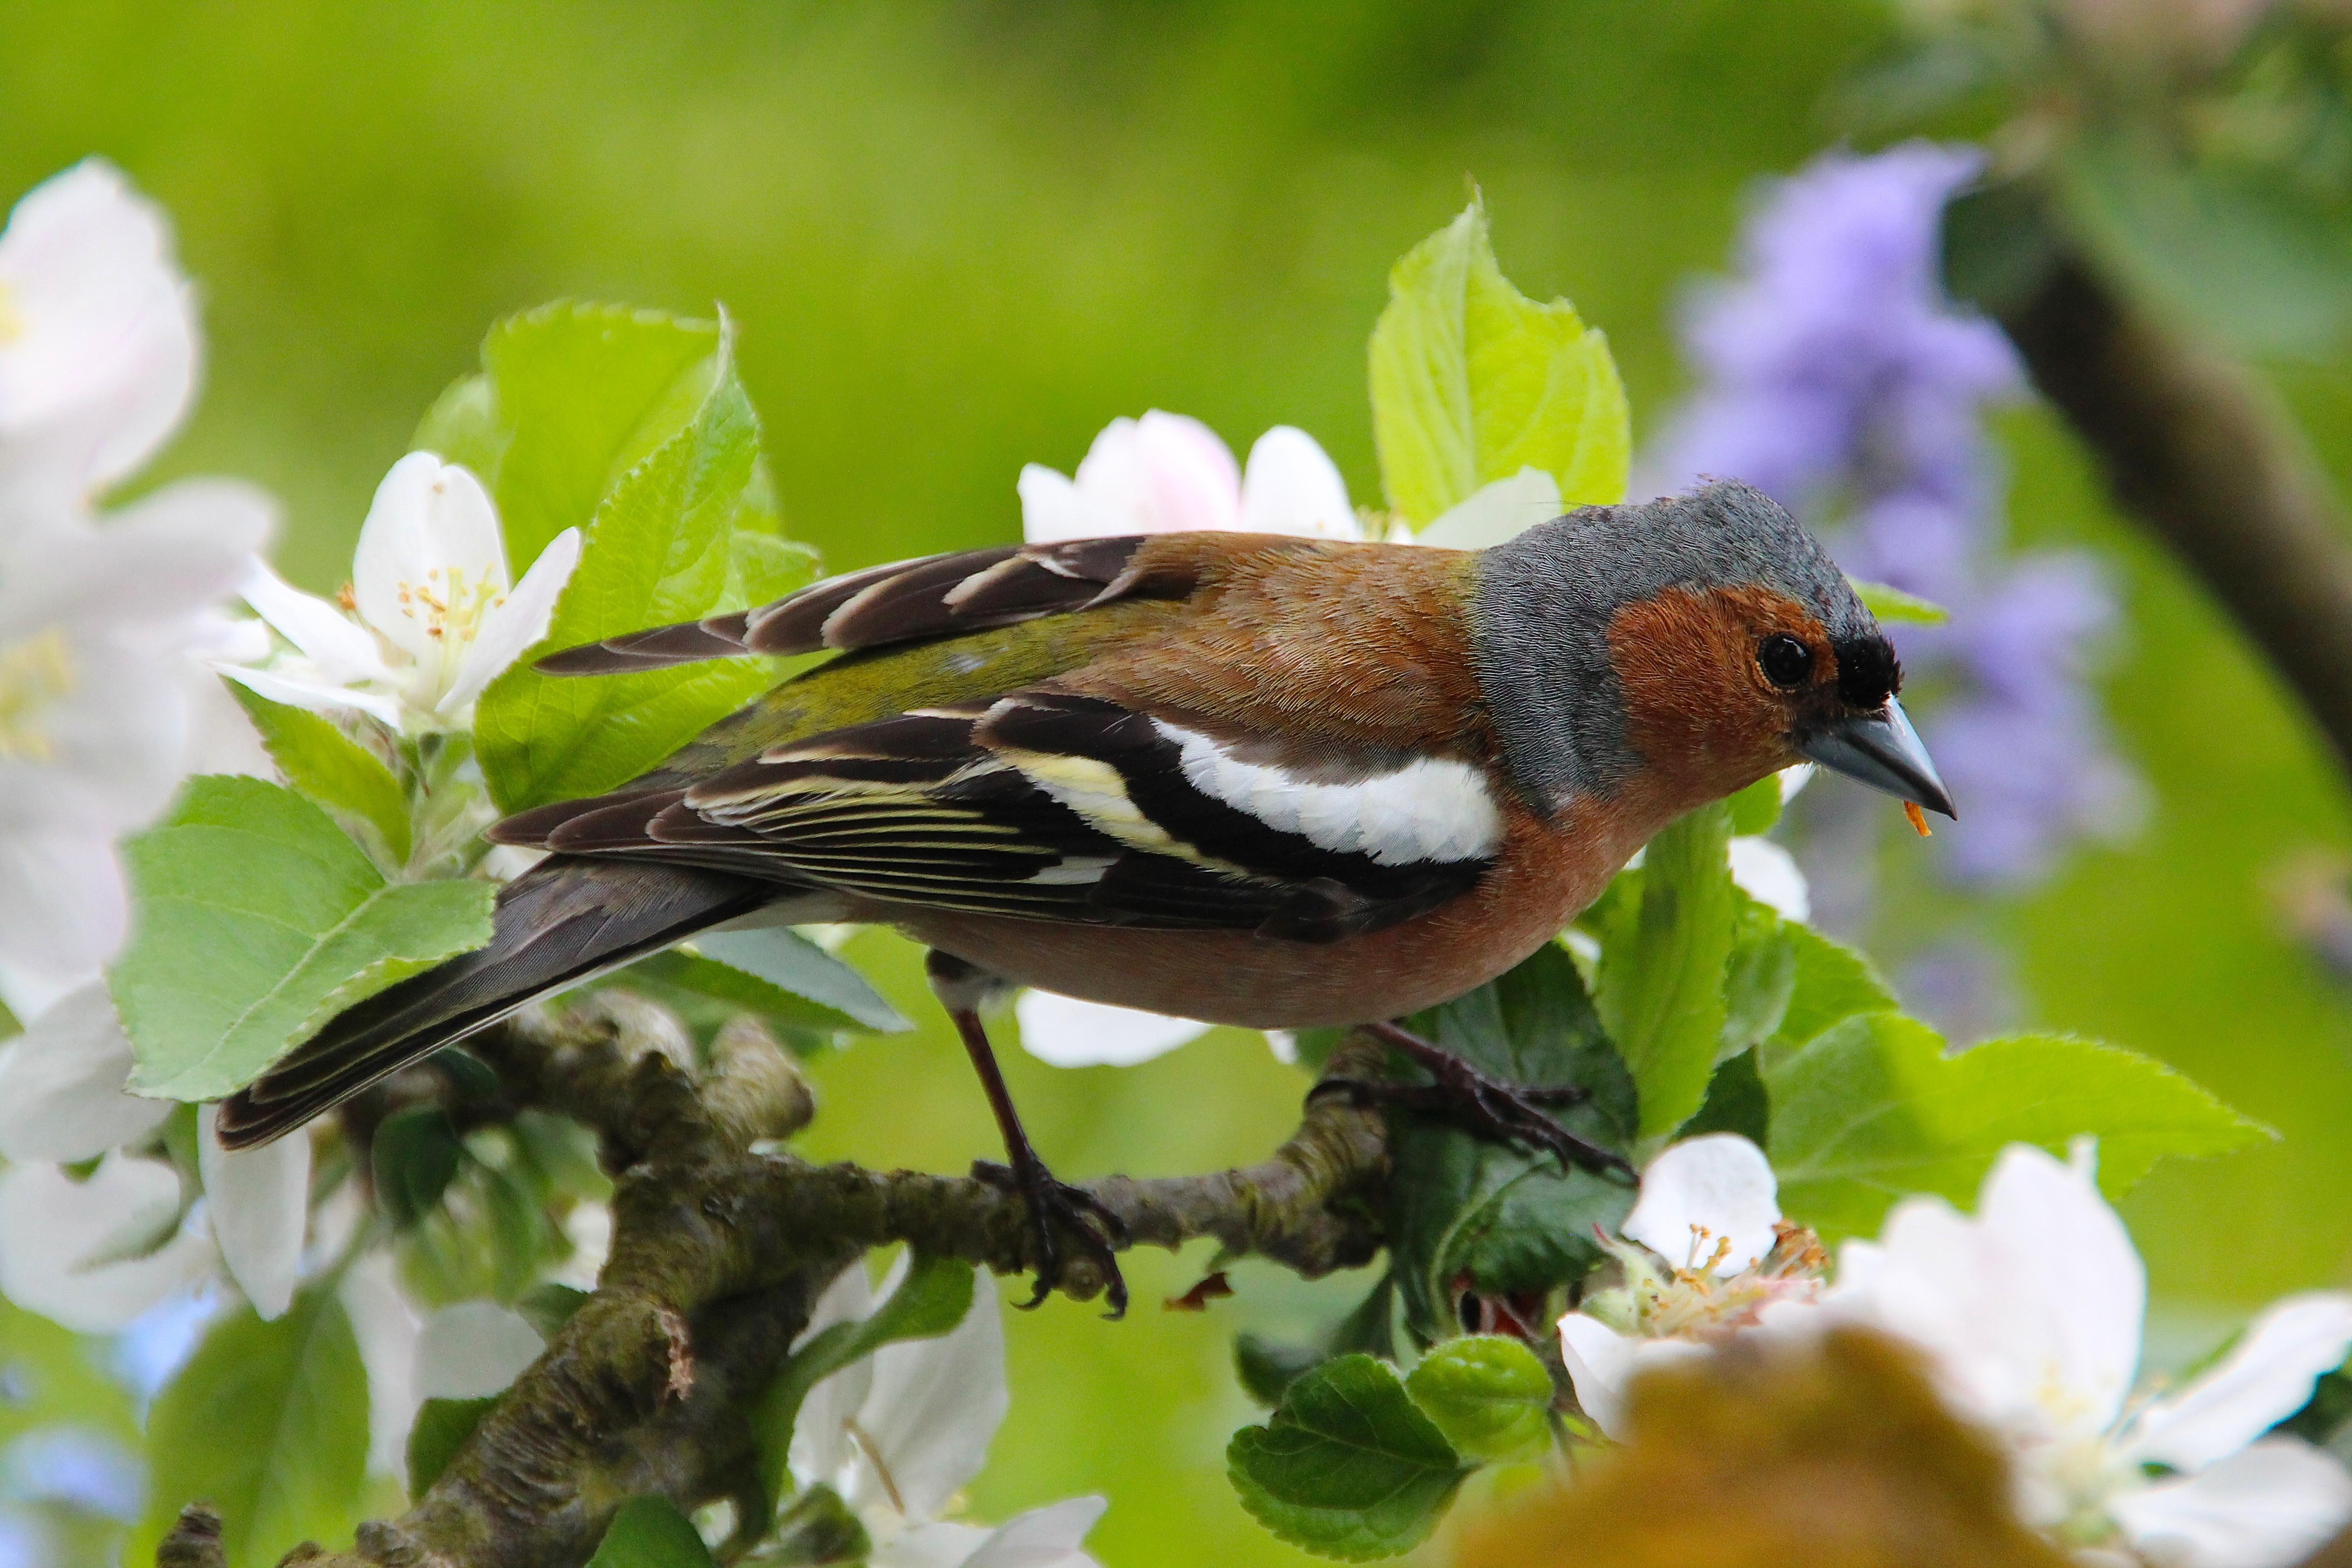 Bird at Giverny. France. 05.09.16